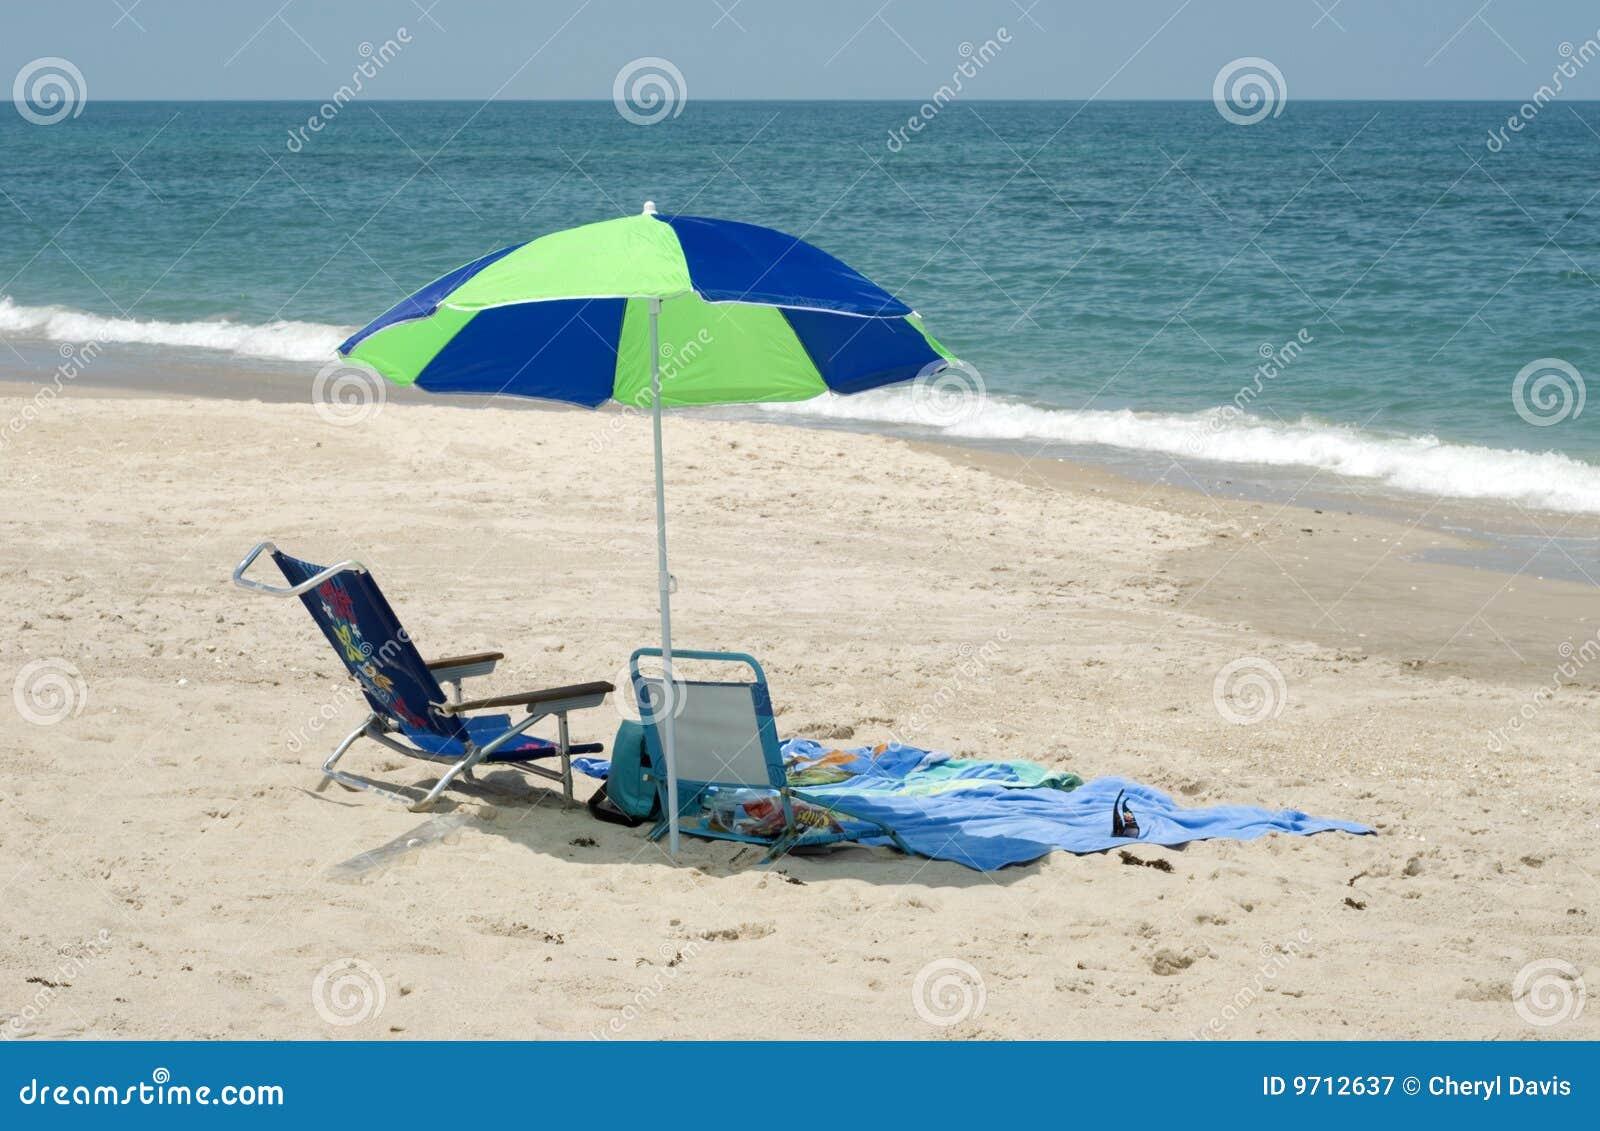 Beach chair with umbrella reanimators